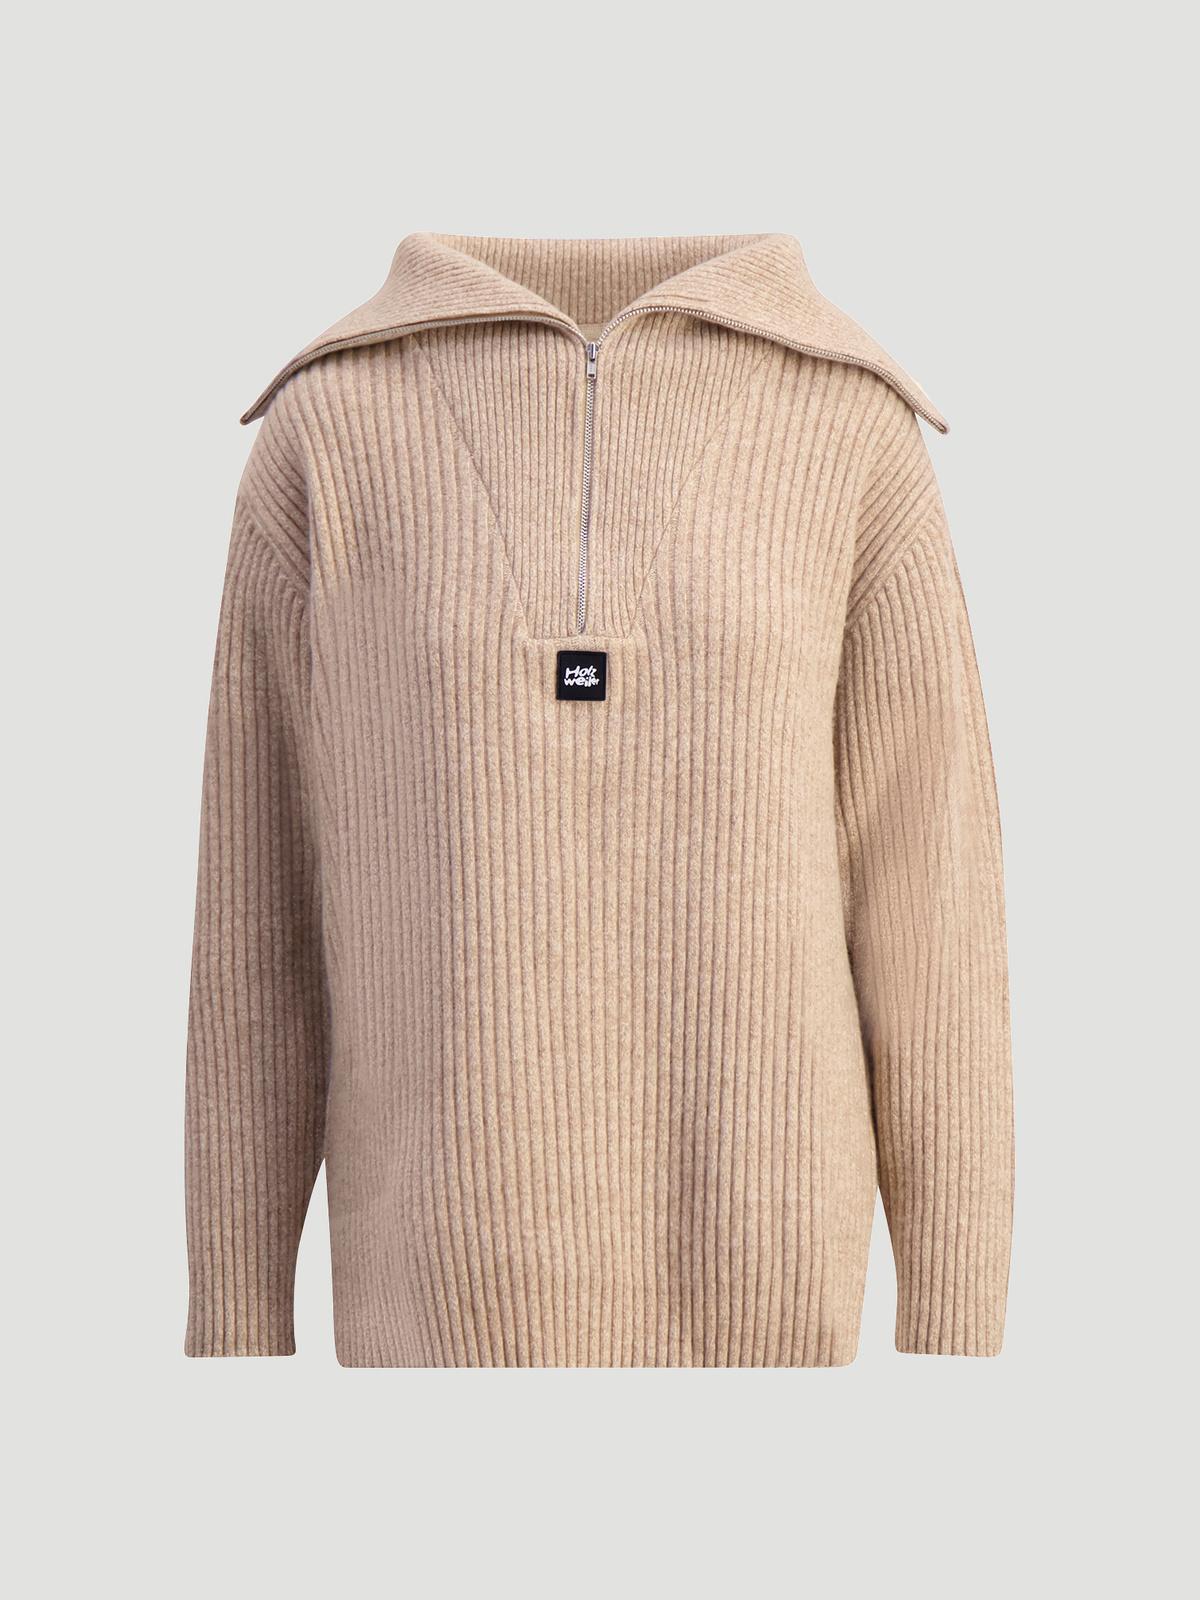 React Knit Sweater  Sand 5